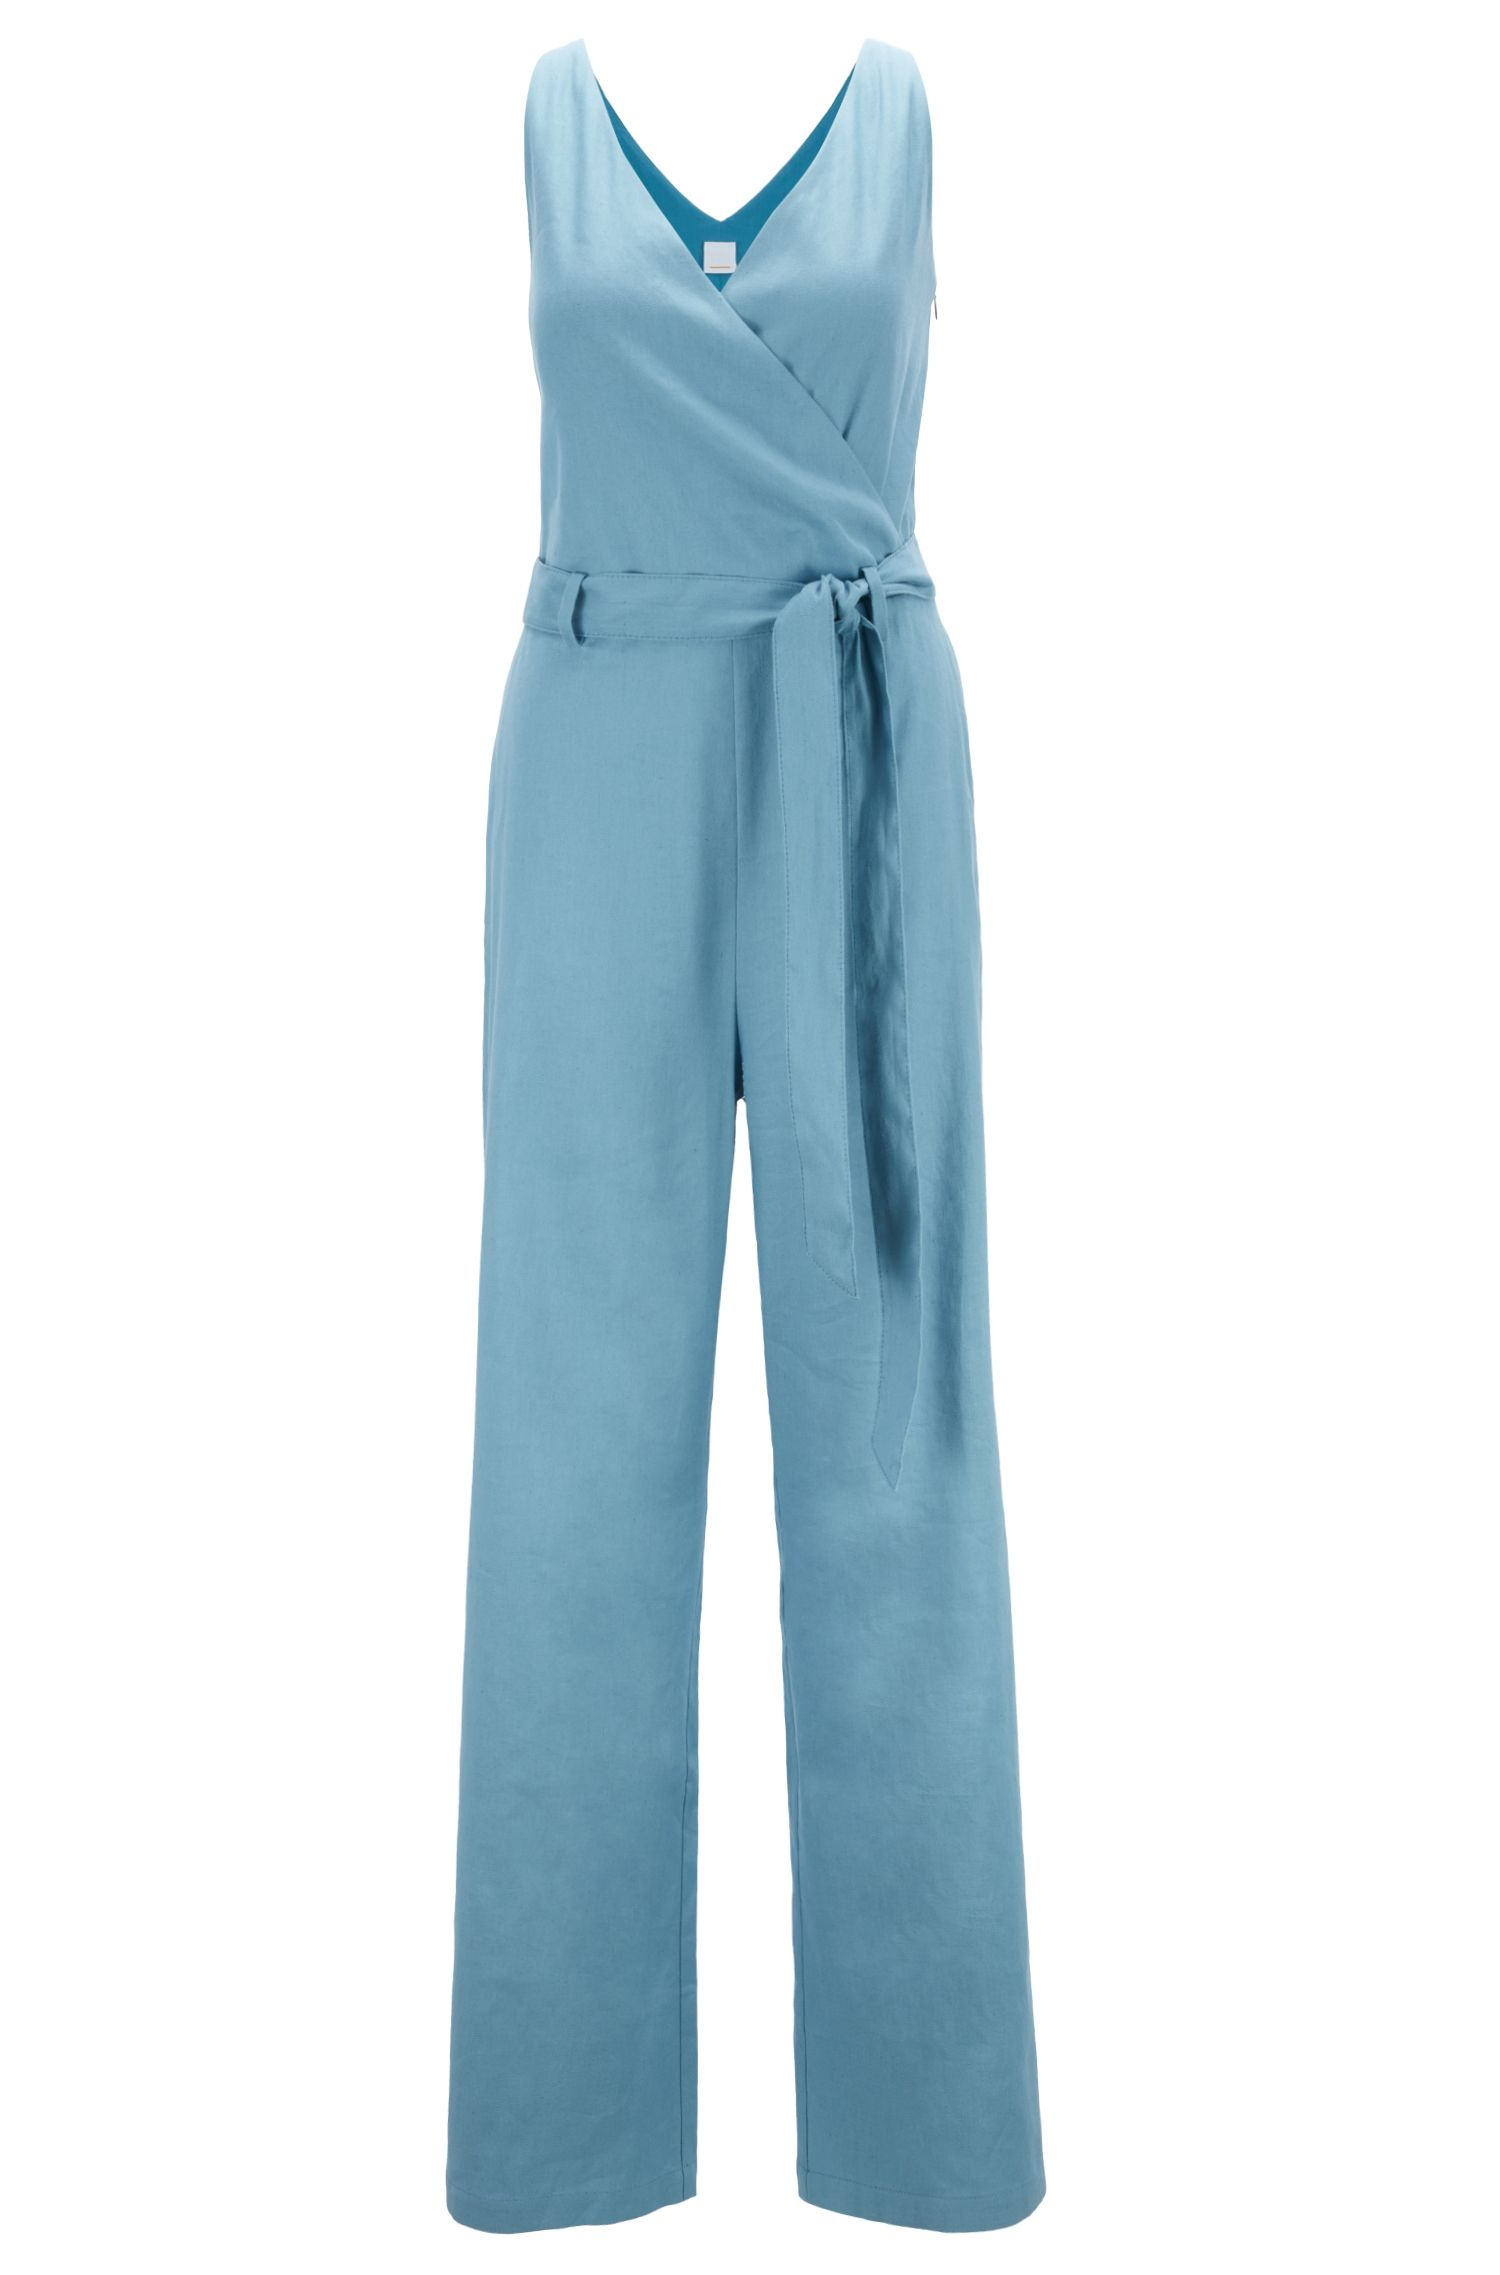 Wrap-front belted jumpsuit in a linen blend, Blue